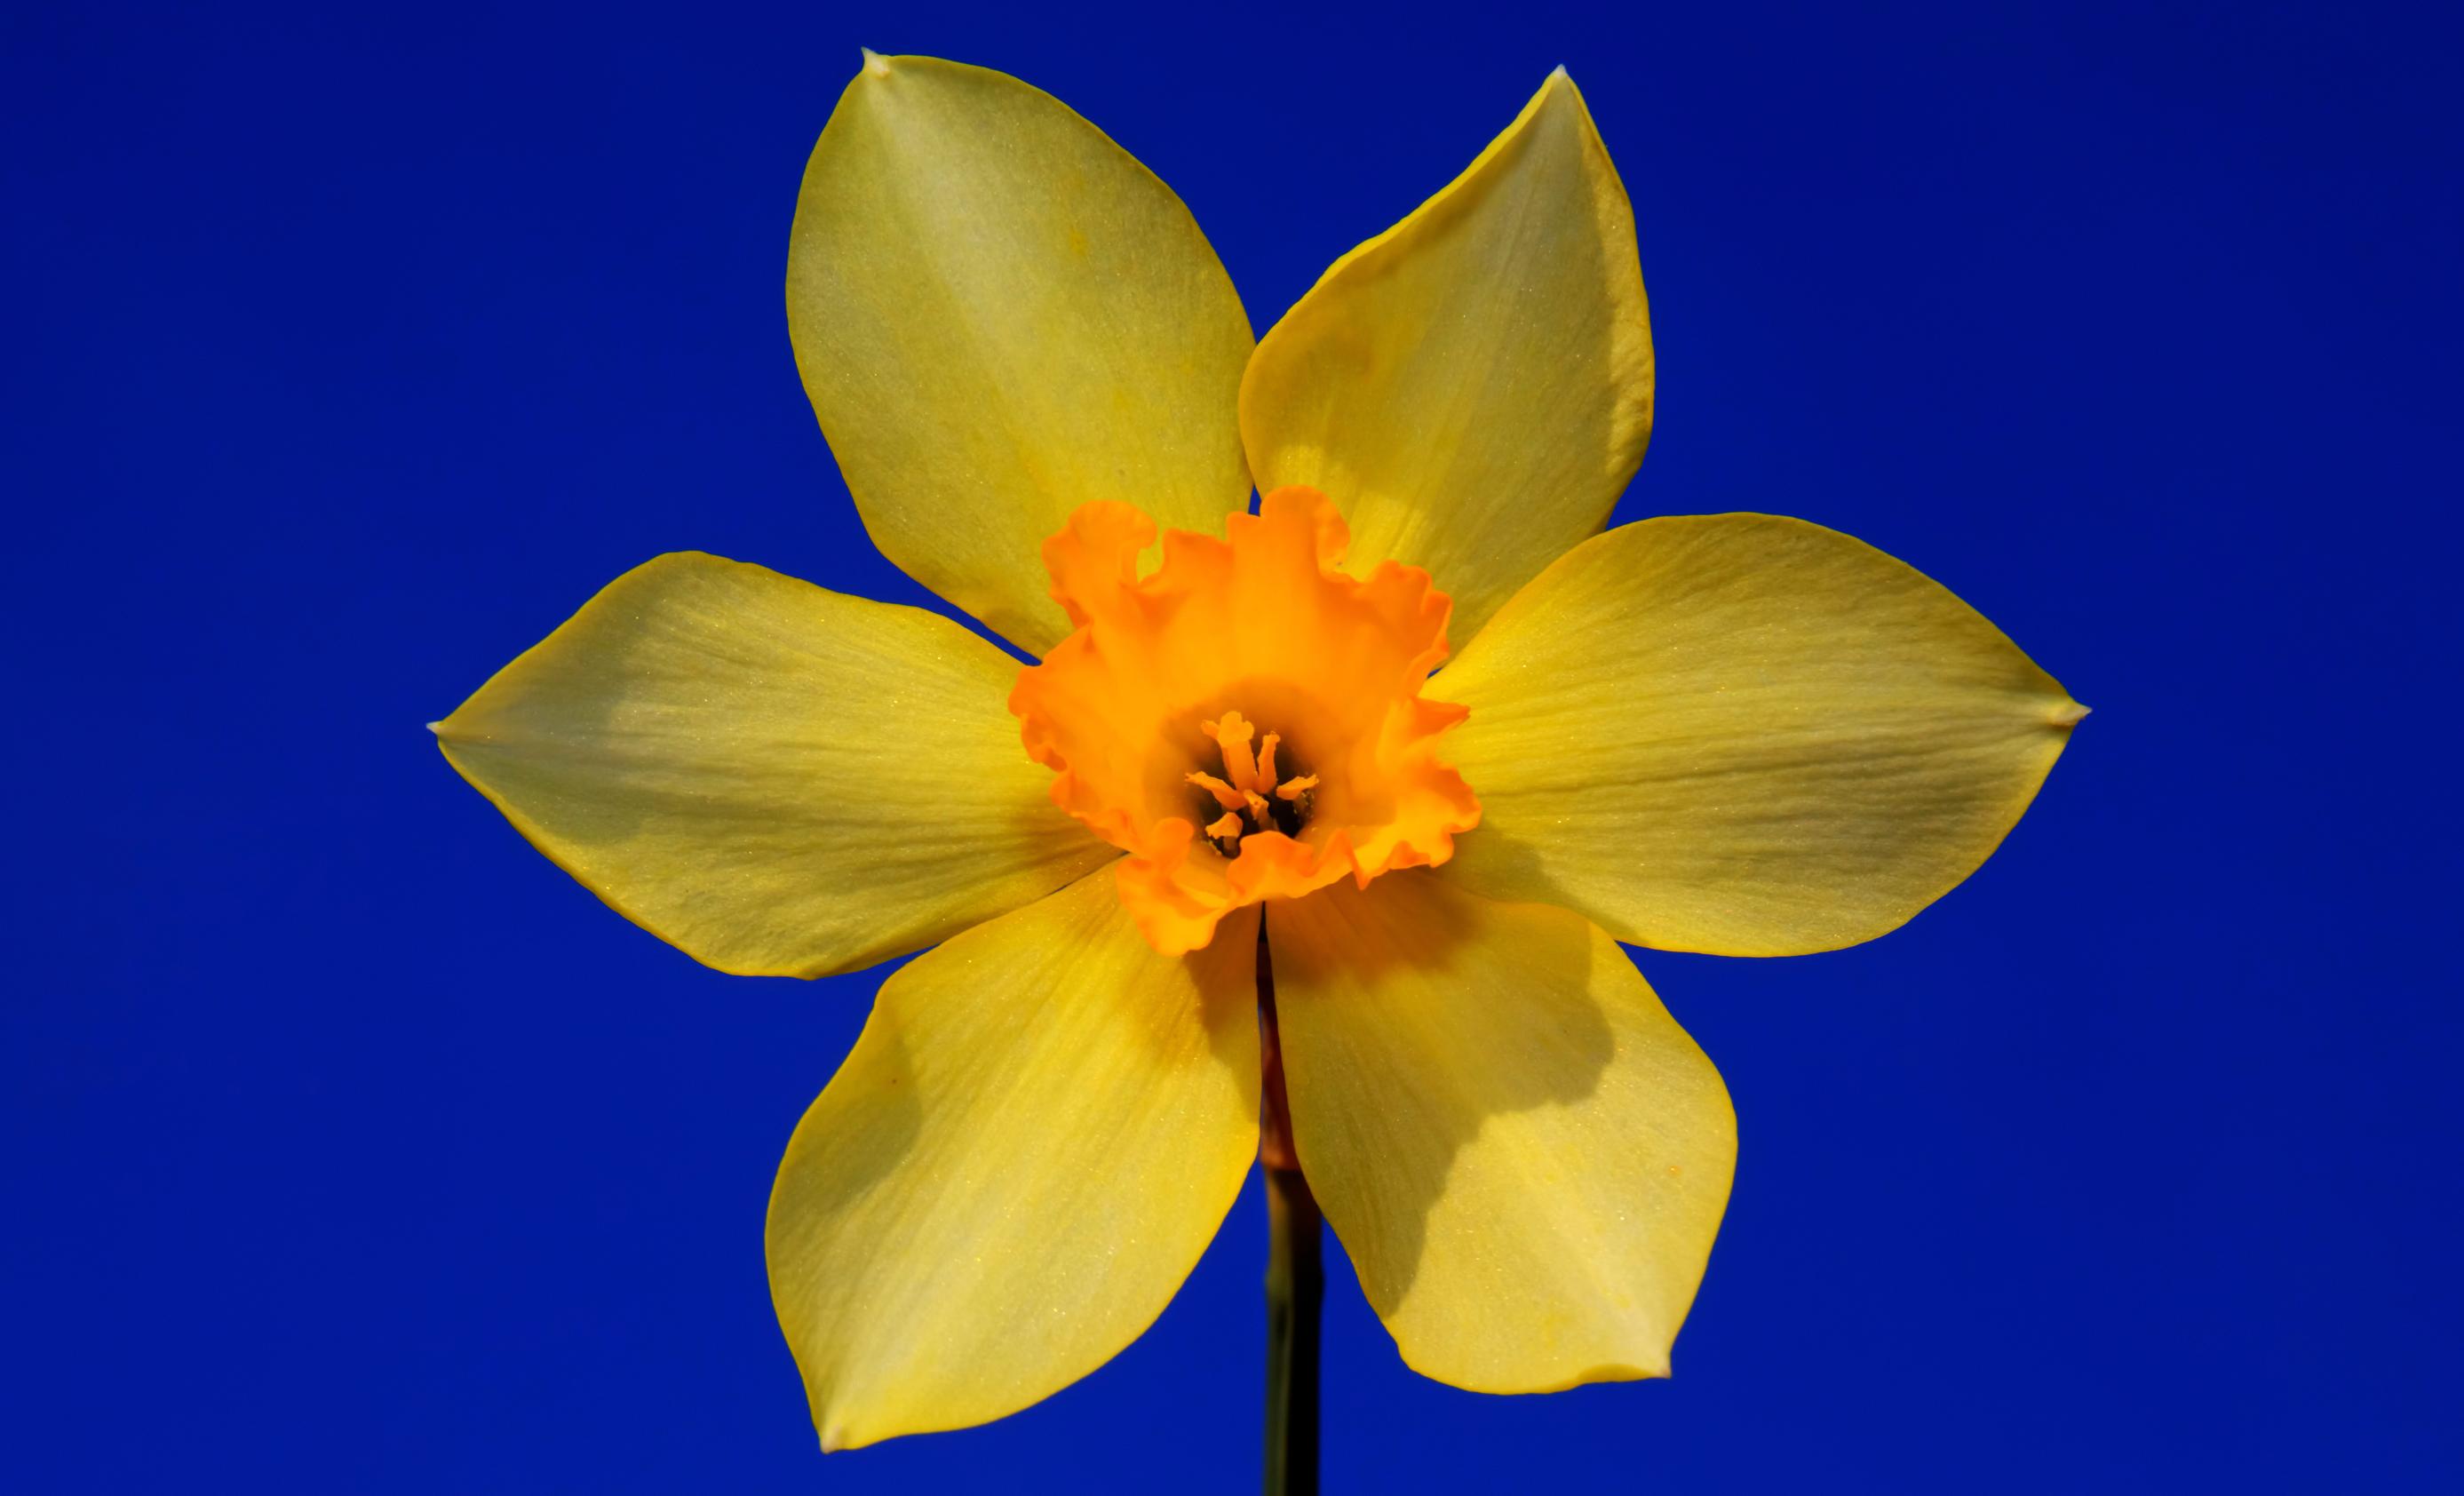 daffodils-photo-80